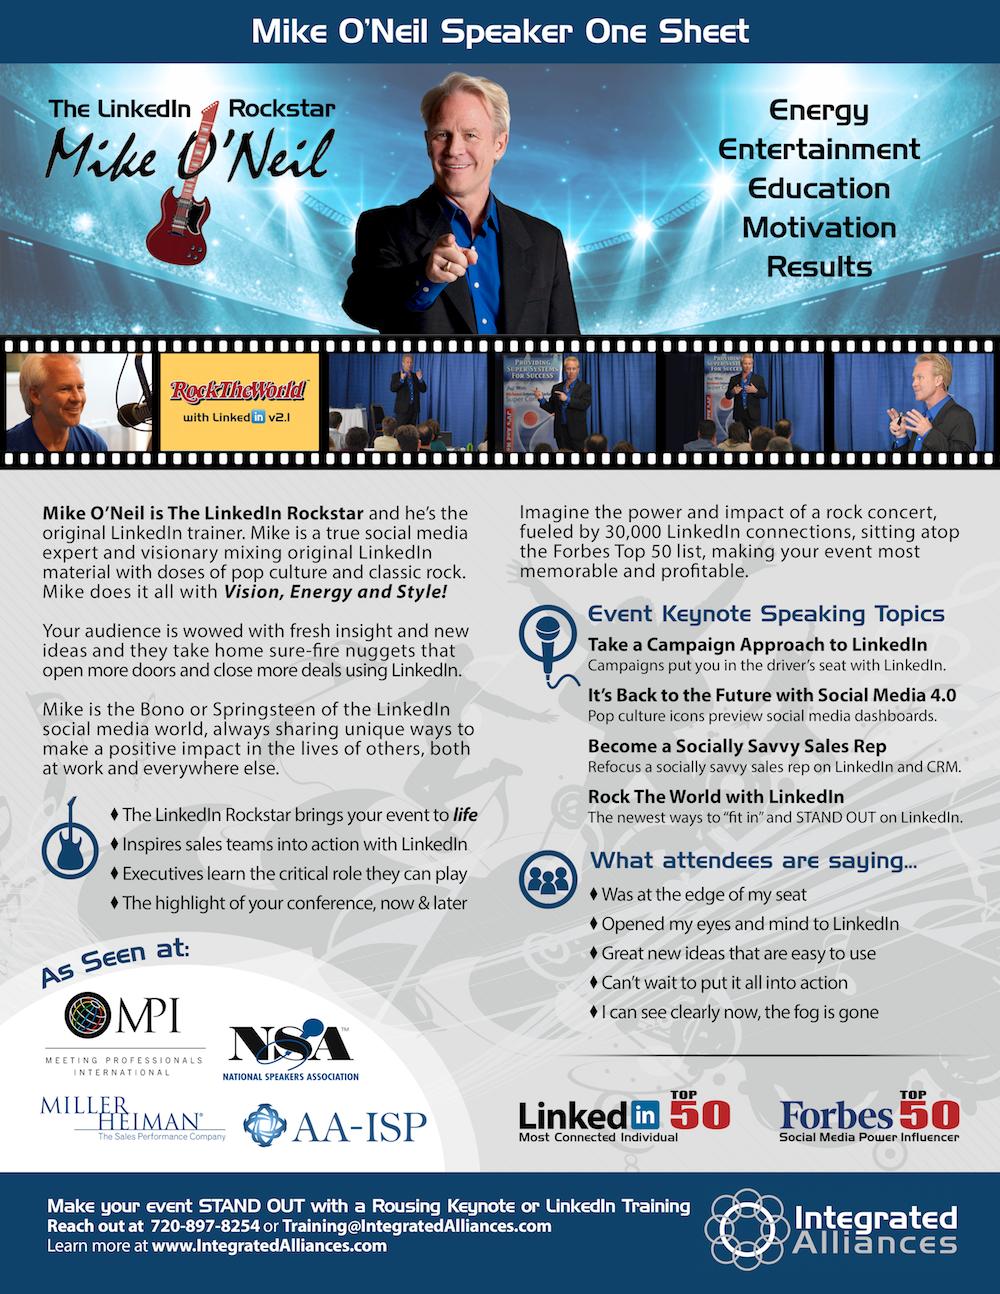 Mike O'Neil Speaker One Sheet 2017